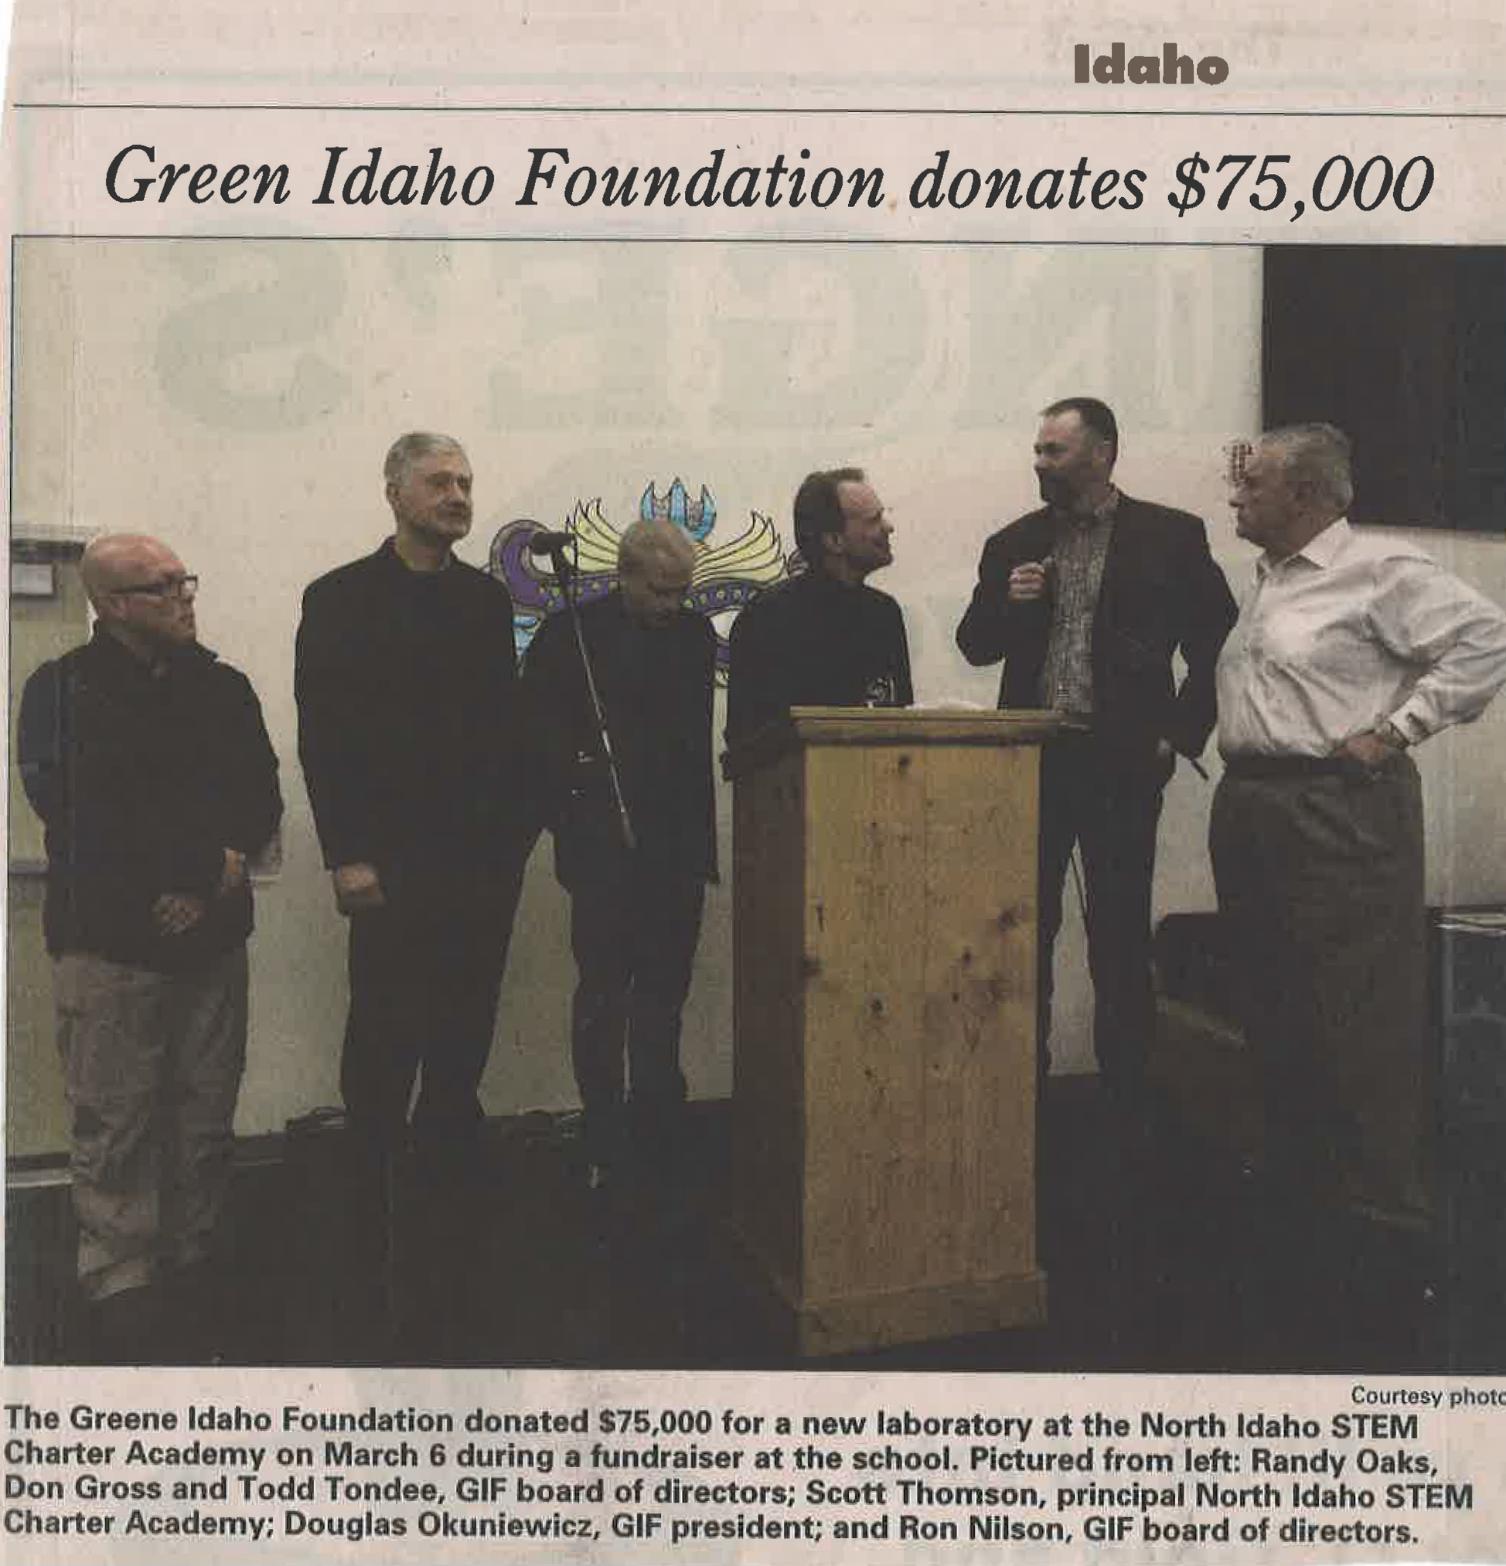 Greene Idaho $75,000 donation to STEM Charter Academy